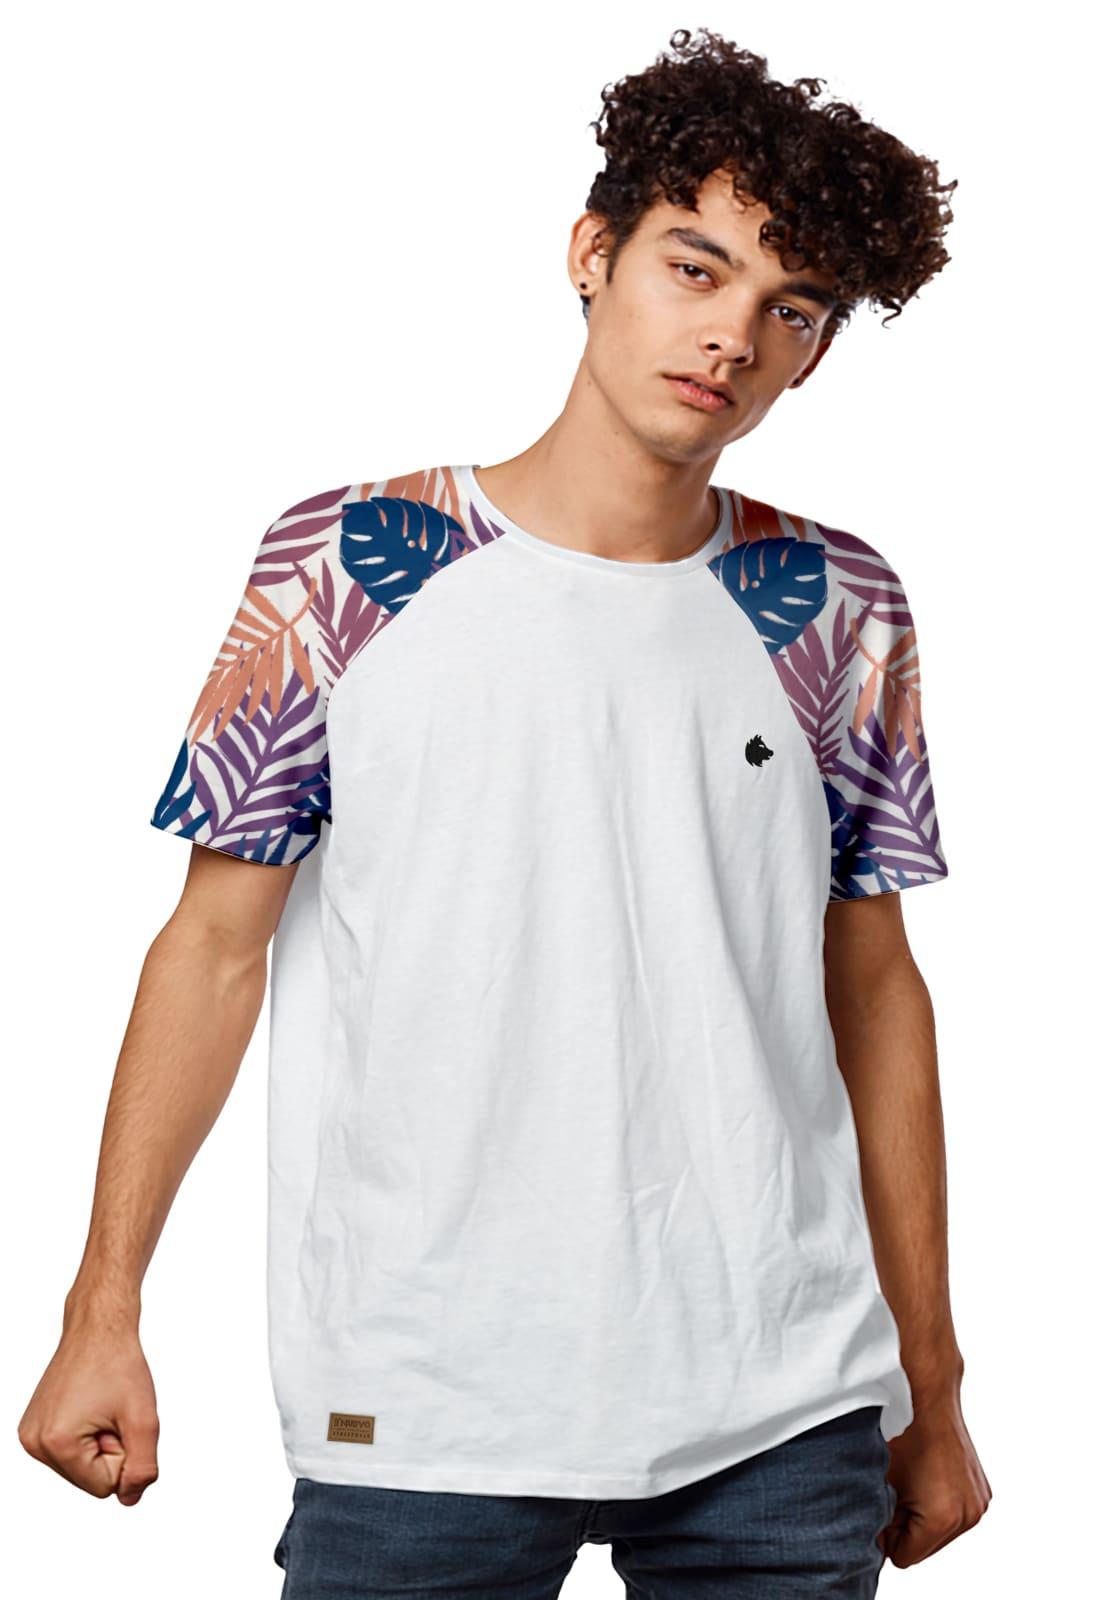 Camiseta Masculina Raglan Floral Tropical Color